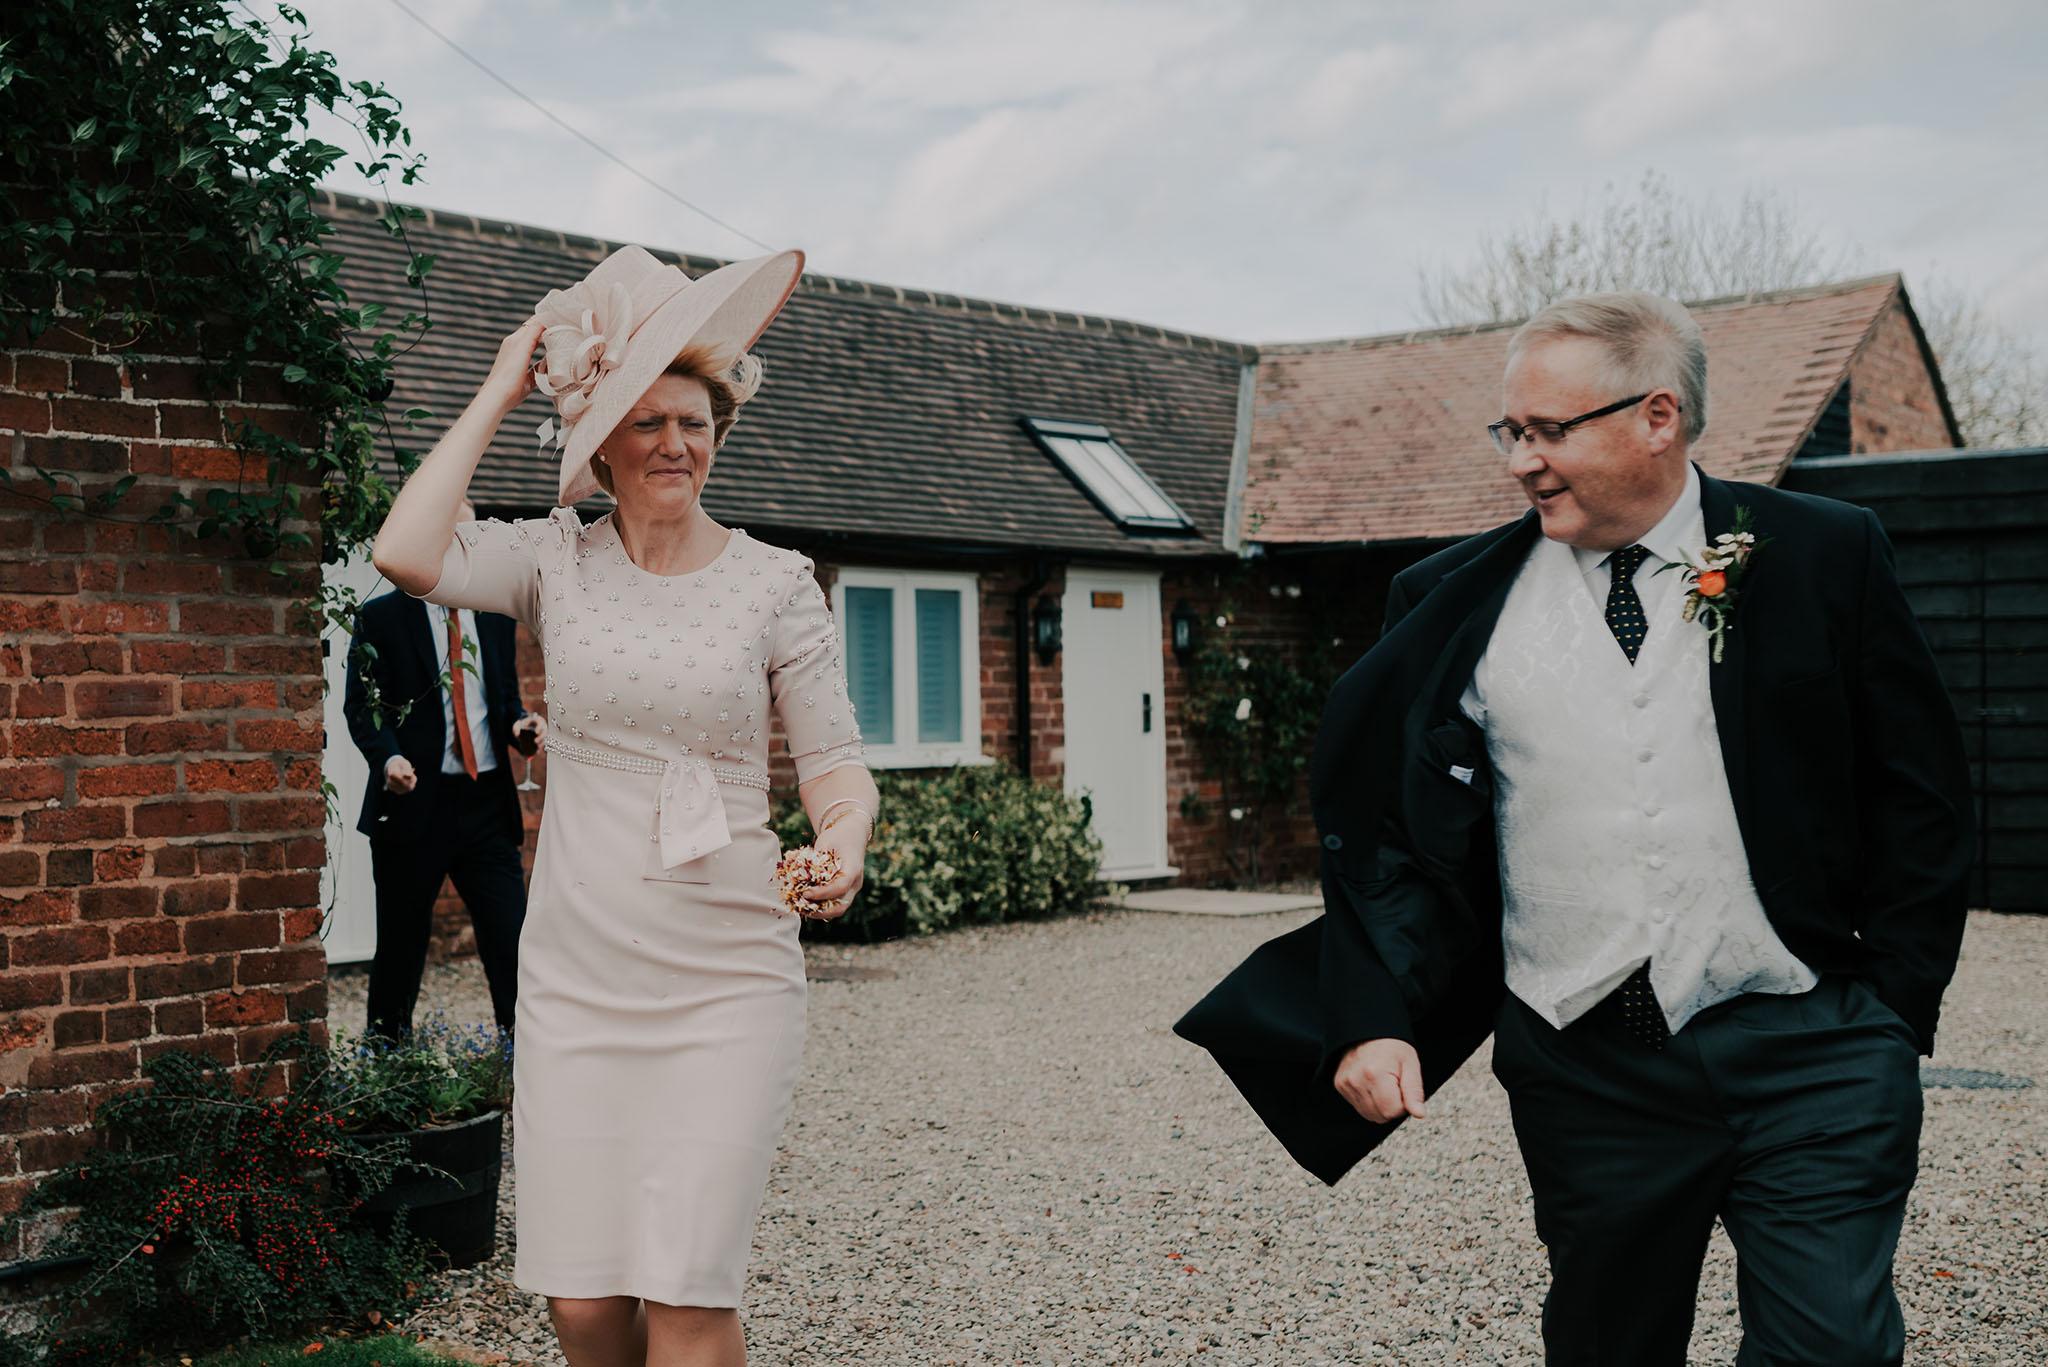 scott-stockwell-photography-wedding-53.jpg